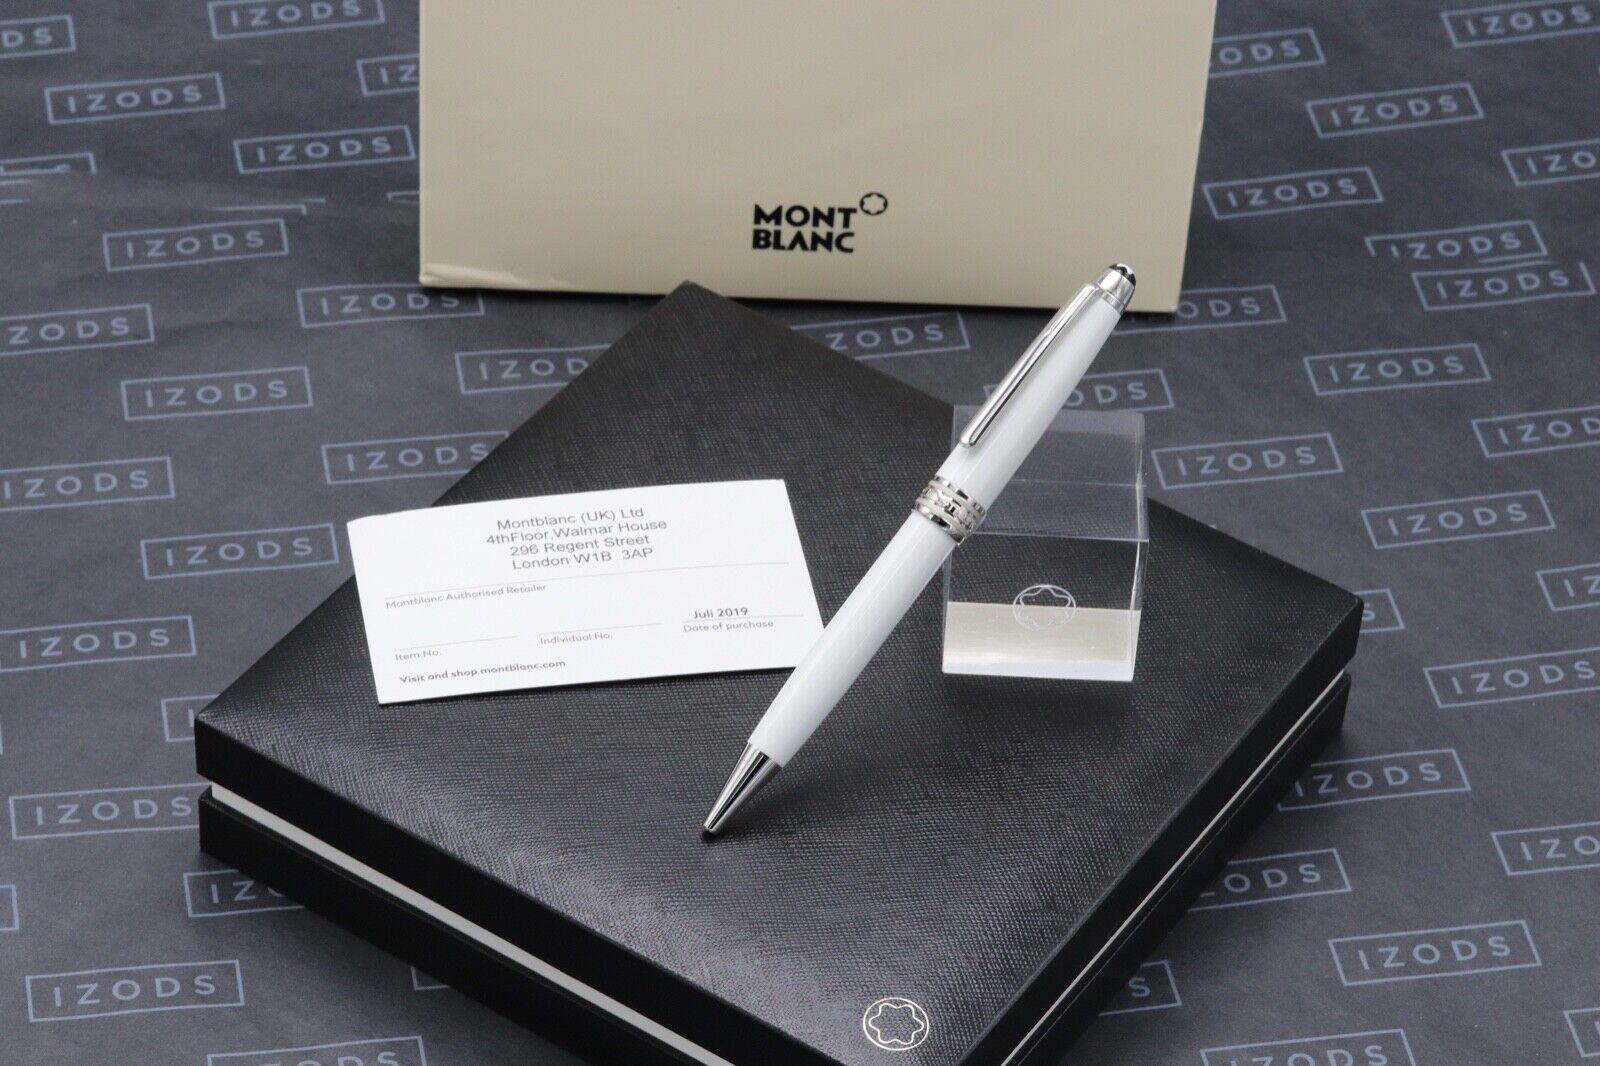 Montblanc Meisterstuck Classique White Solitaire Ballpoint Pen - UNUSED